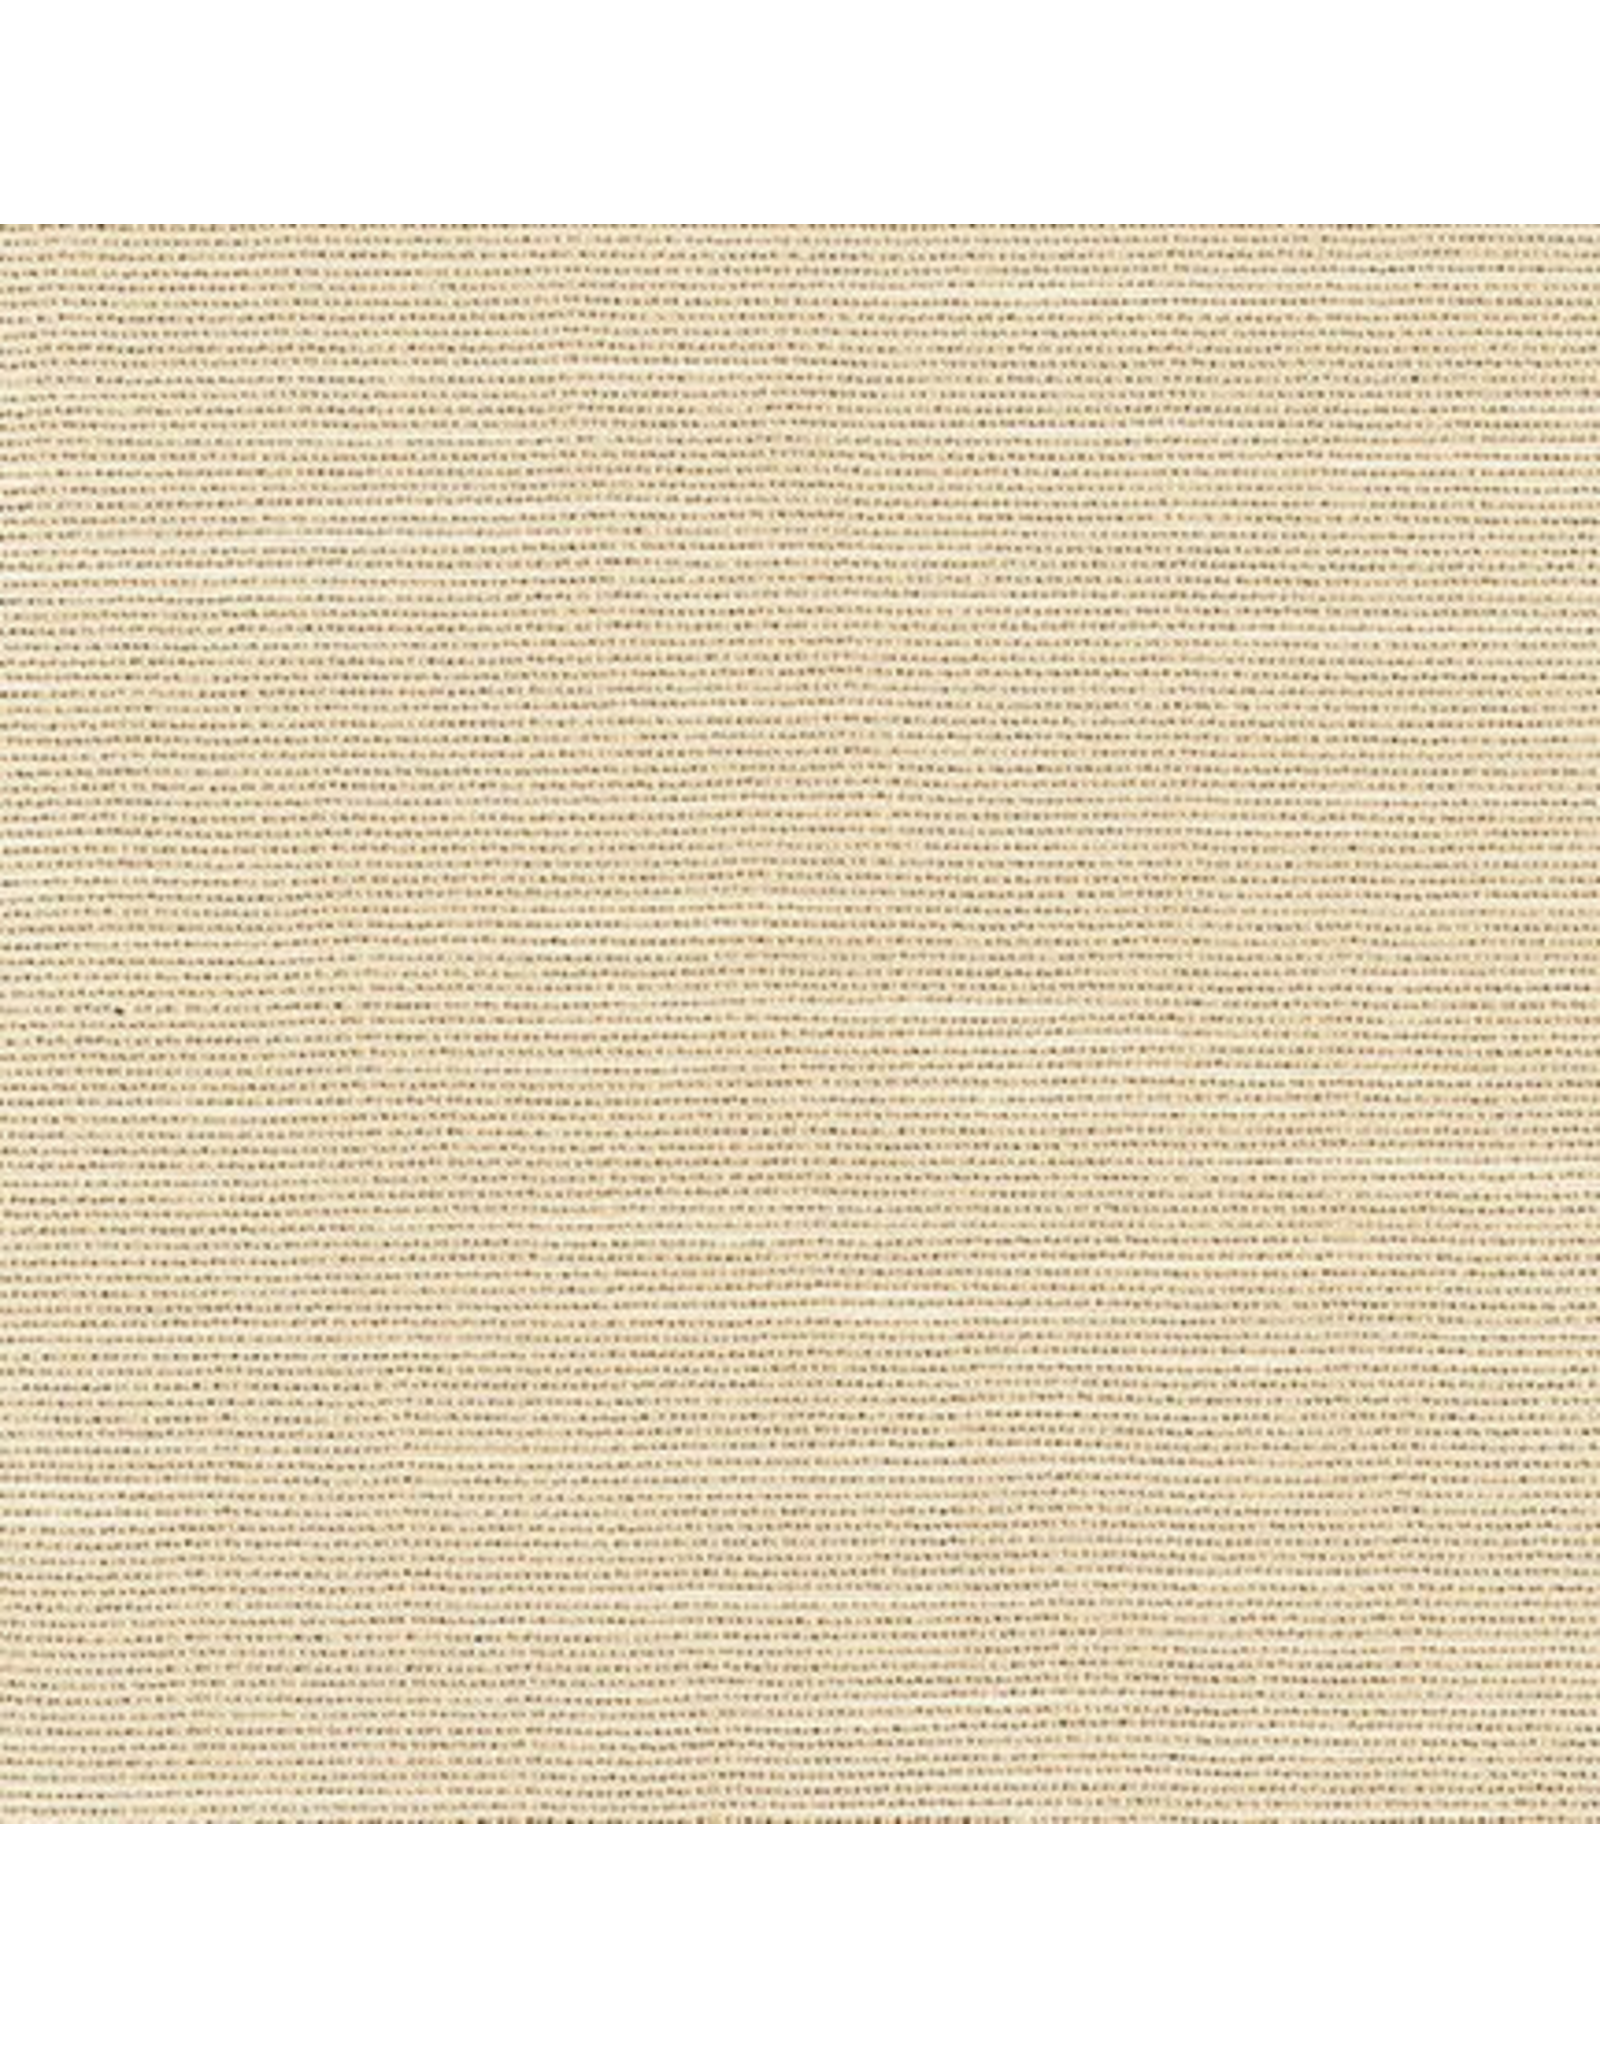 Robert Kaufman Manchester Metallic in Eggshell, Fabric Half-Yards SRKM-15373-86